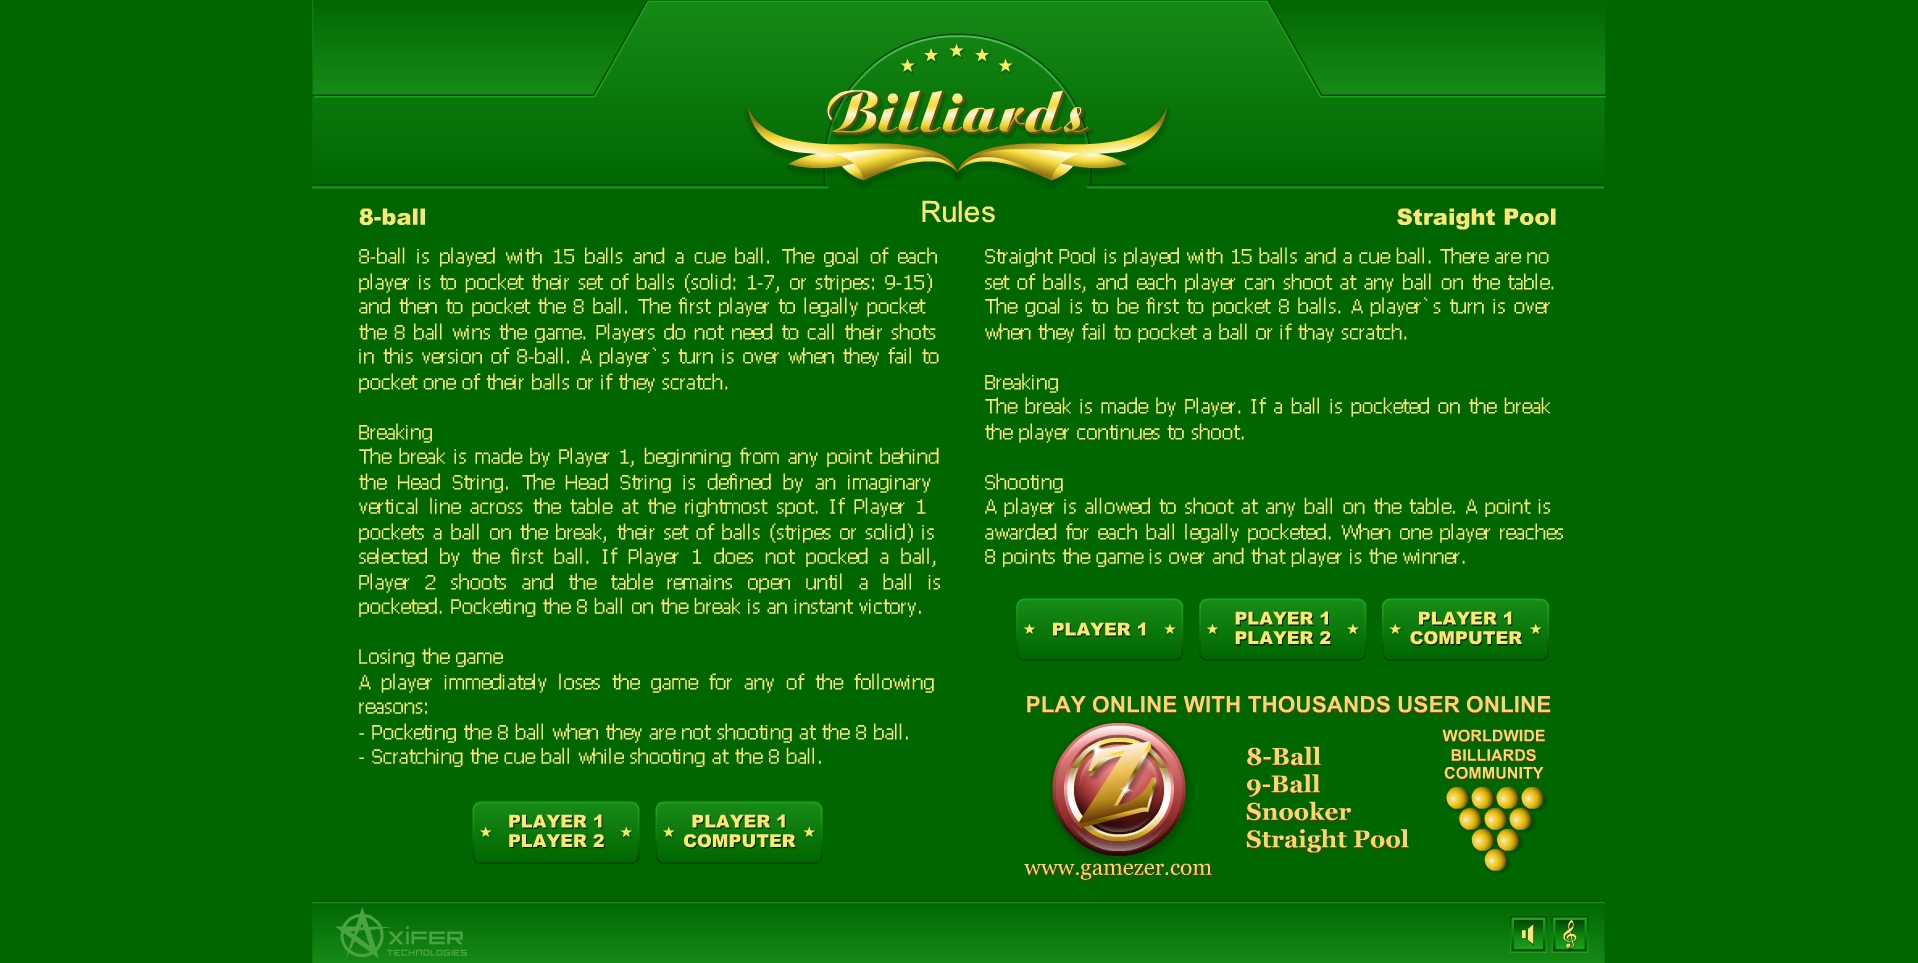 Jeu Billard Billiards Gratuit En Ligne tout Jeux Gratuit Billard